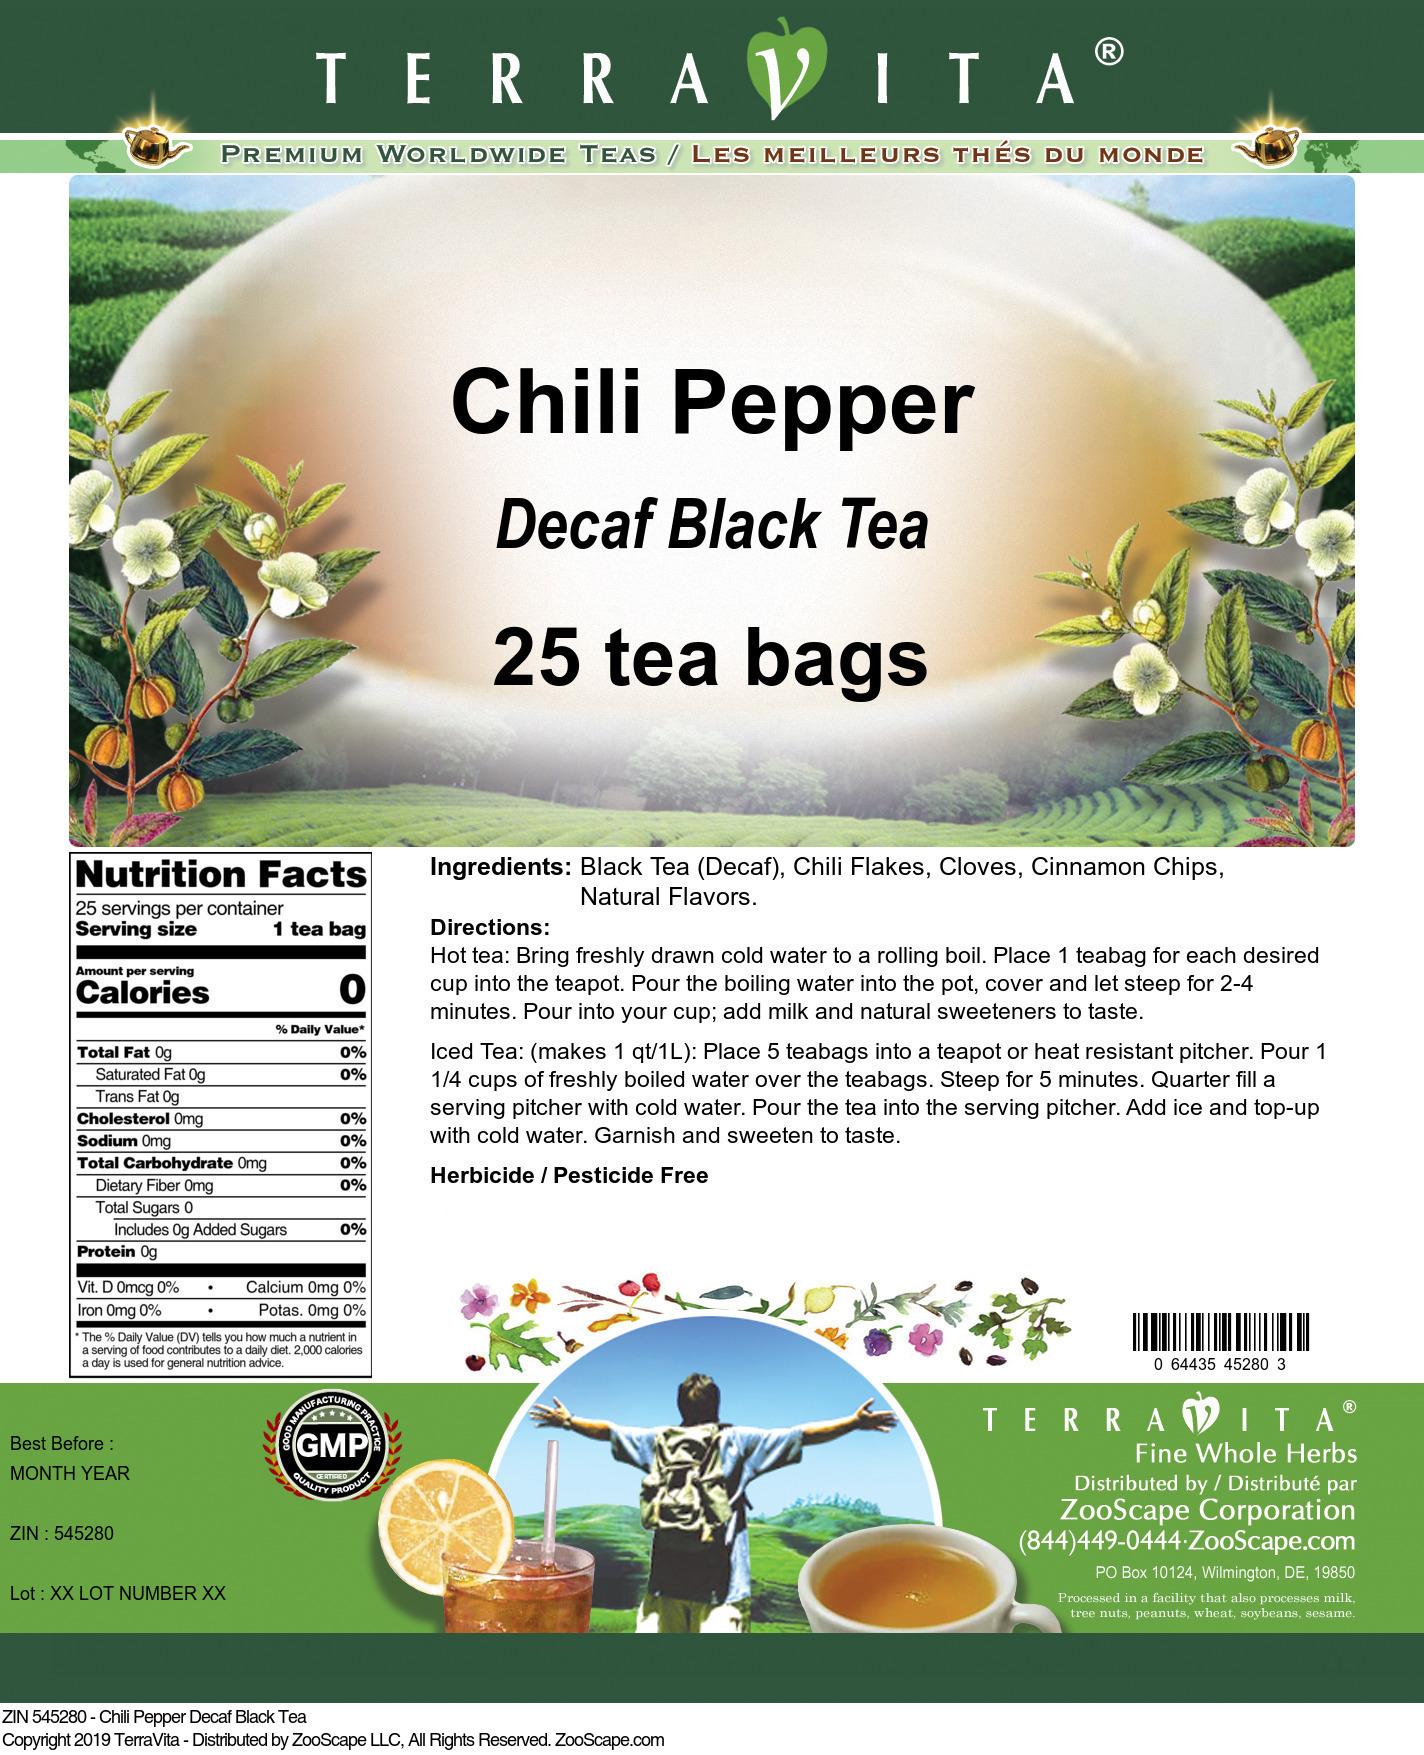 Chili Pepper Decaf Black Tea